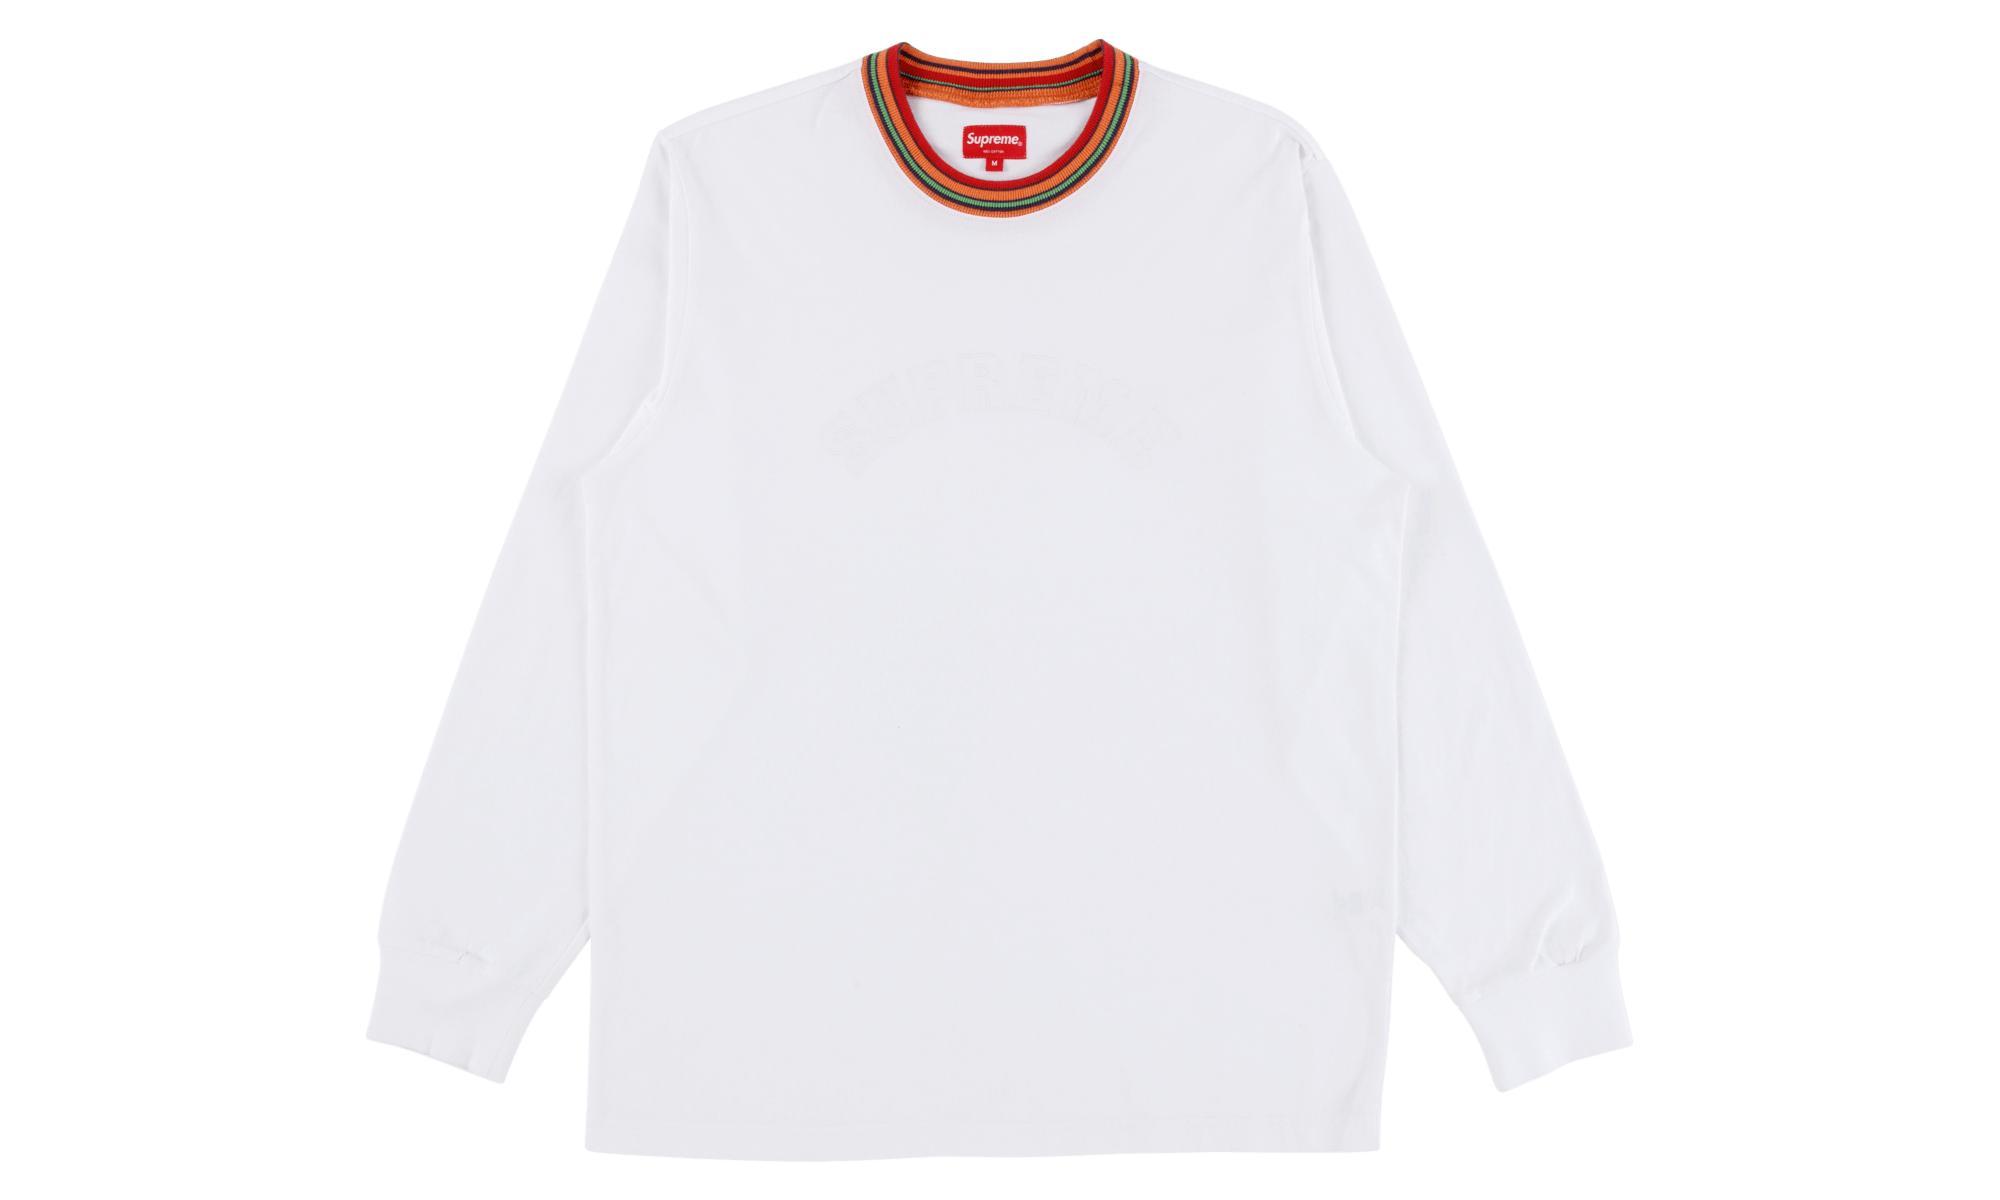 6b6b2c55ee27 Supreme Multicolor Striped Rib L s Top in White for Men - Lyst